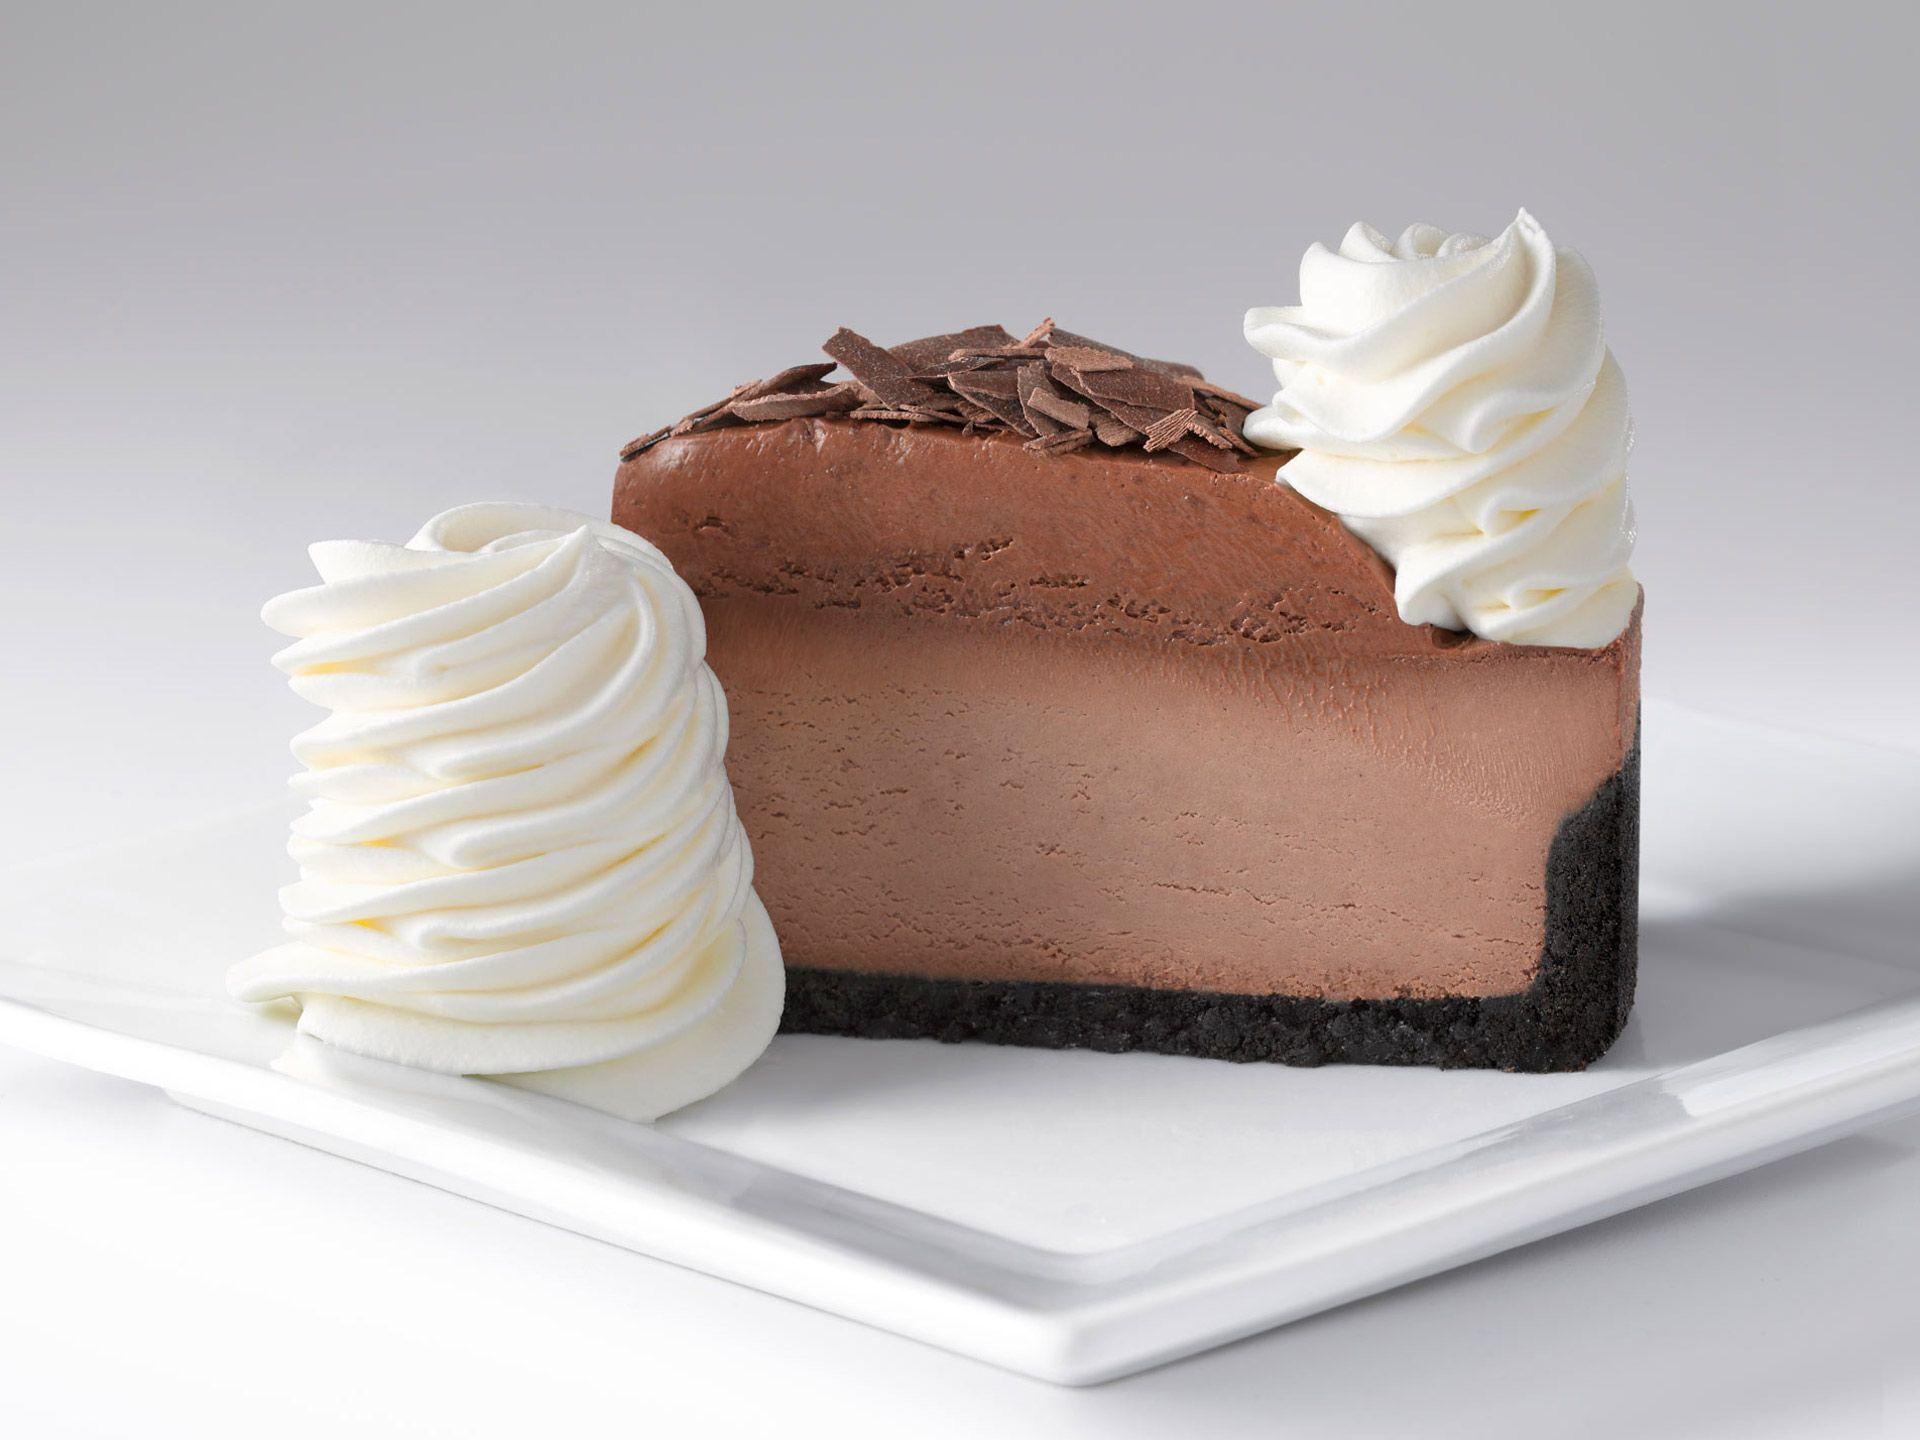 Chocolate Mousse Cheesecake Silky Chocolate Cheesecake